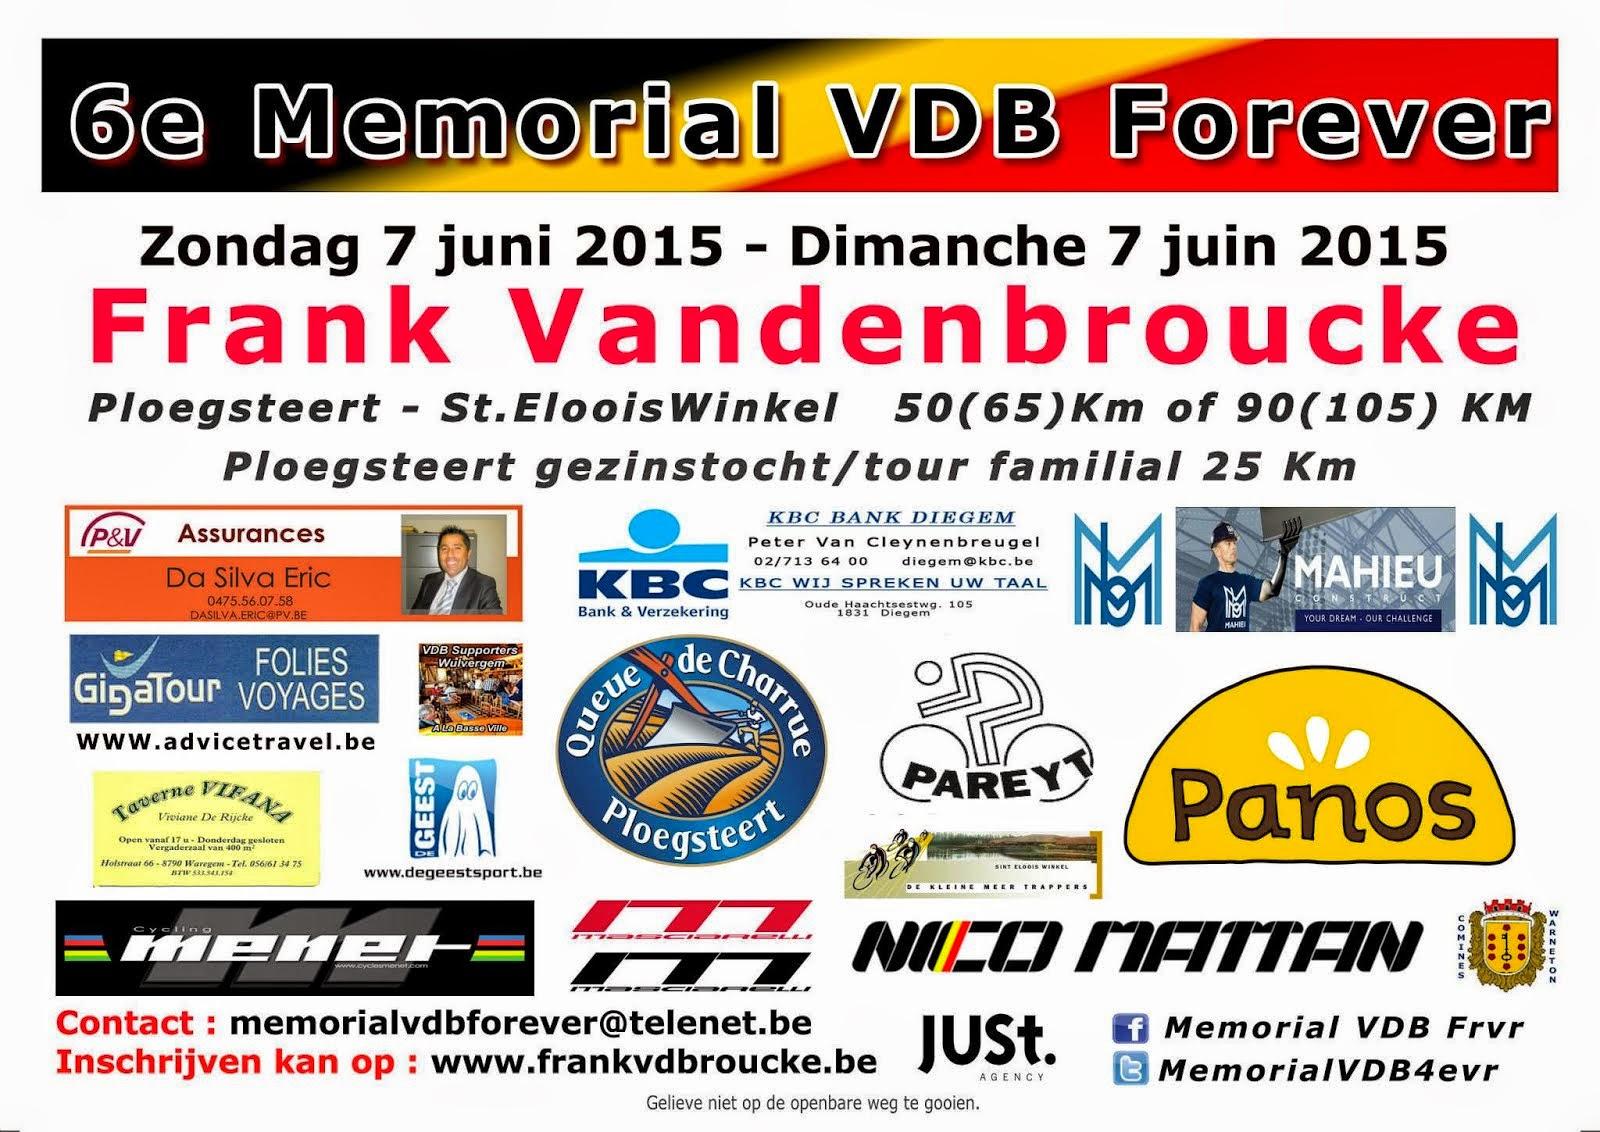 7 juin Mémorial VDB Forever.